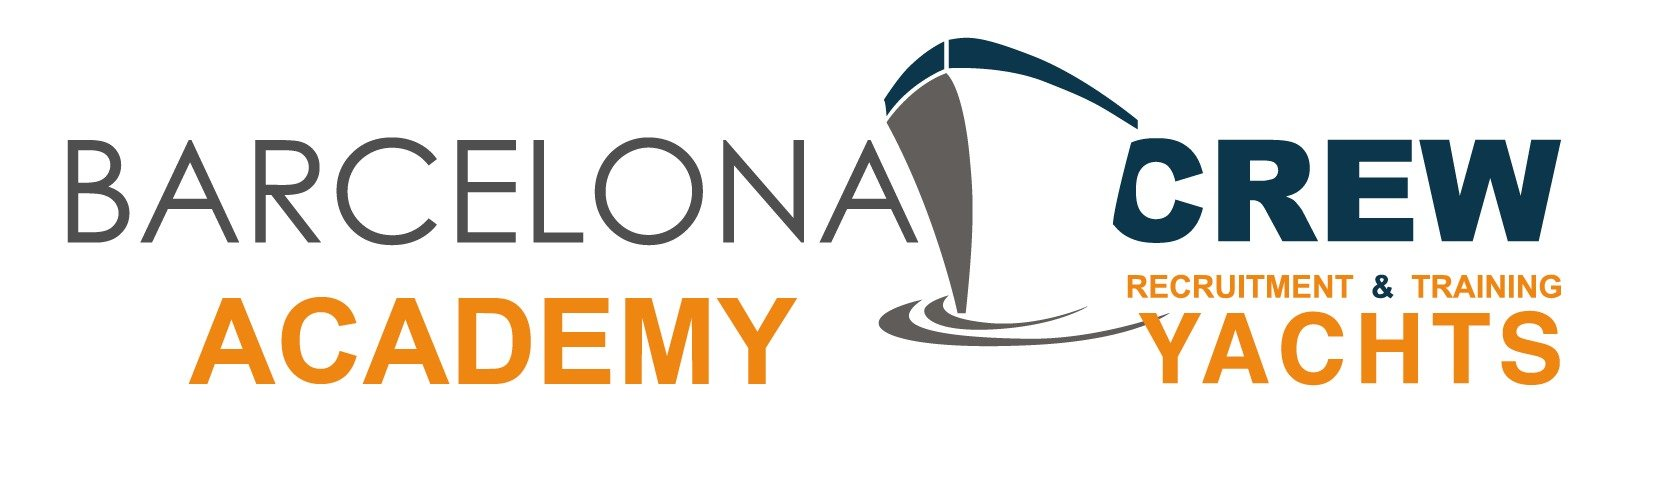 barcelona crew academy